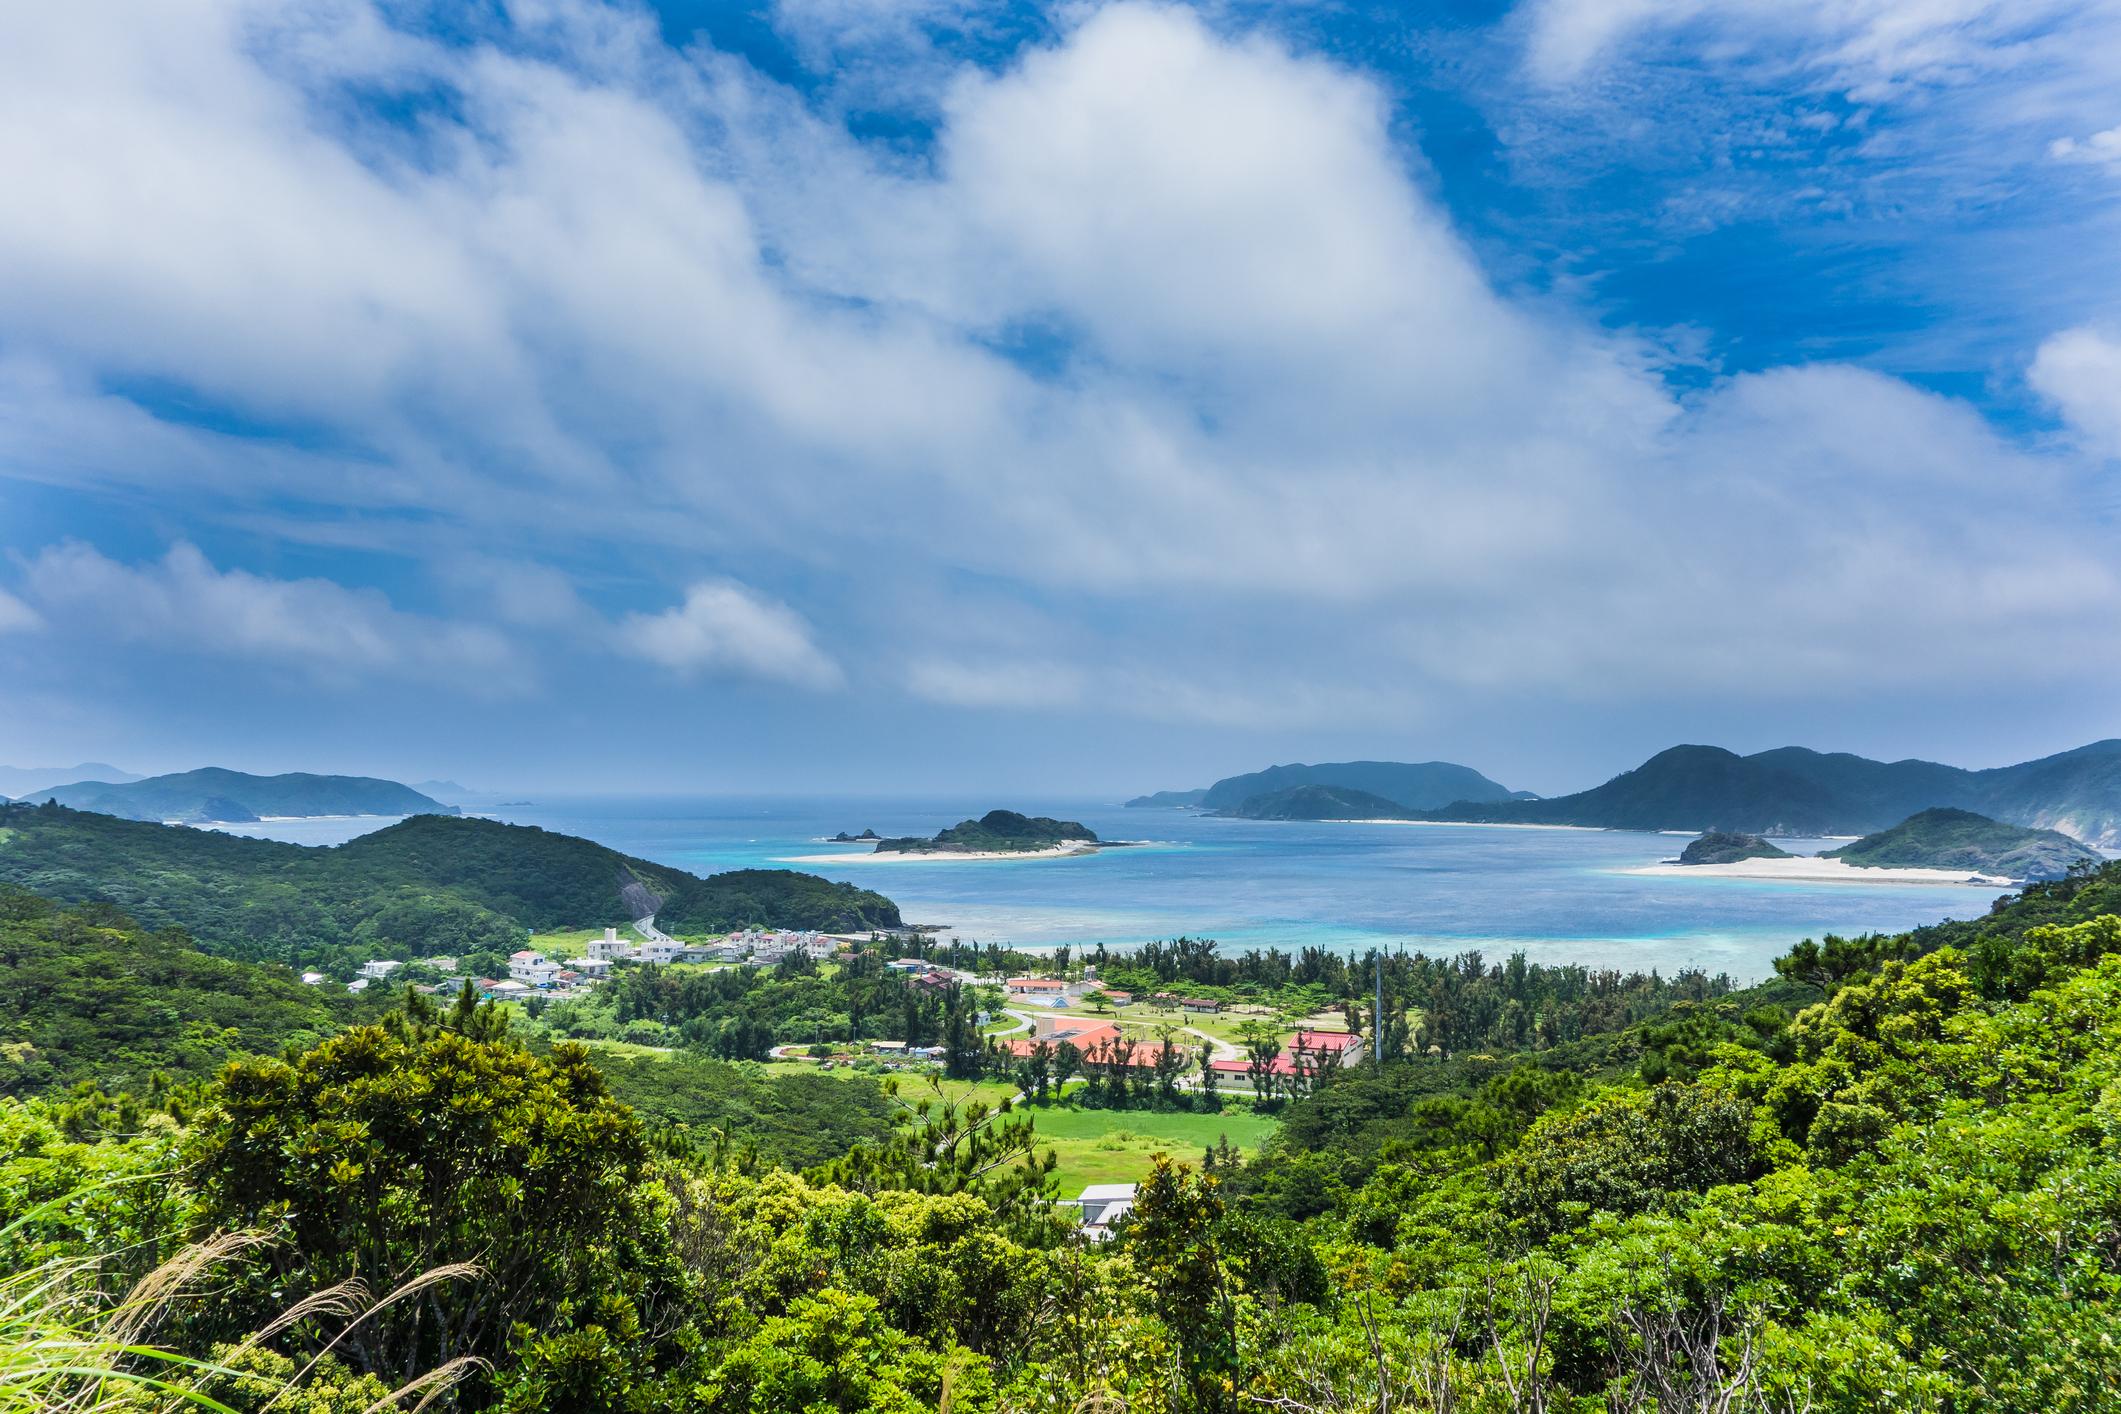 Zamami Island, Okinawa Prefecture, Japan